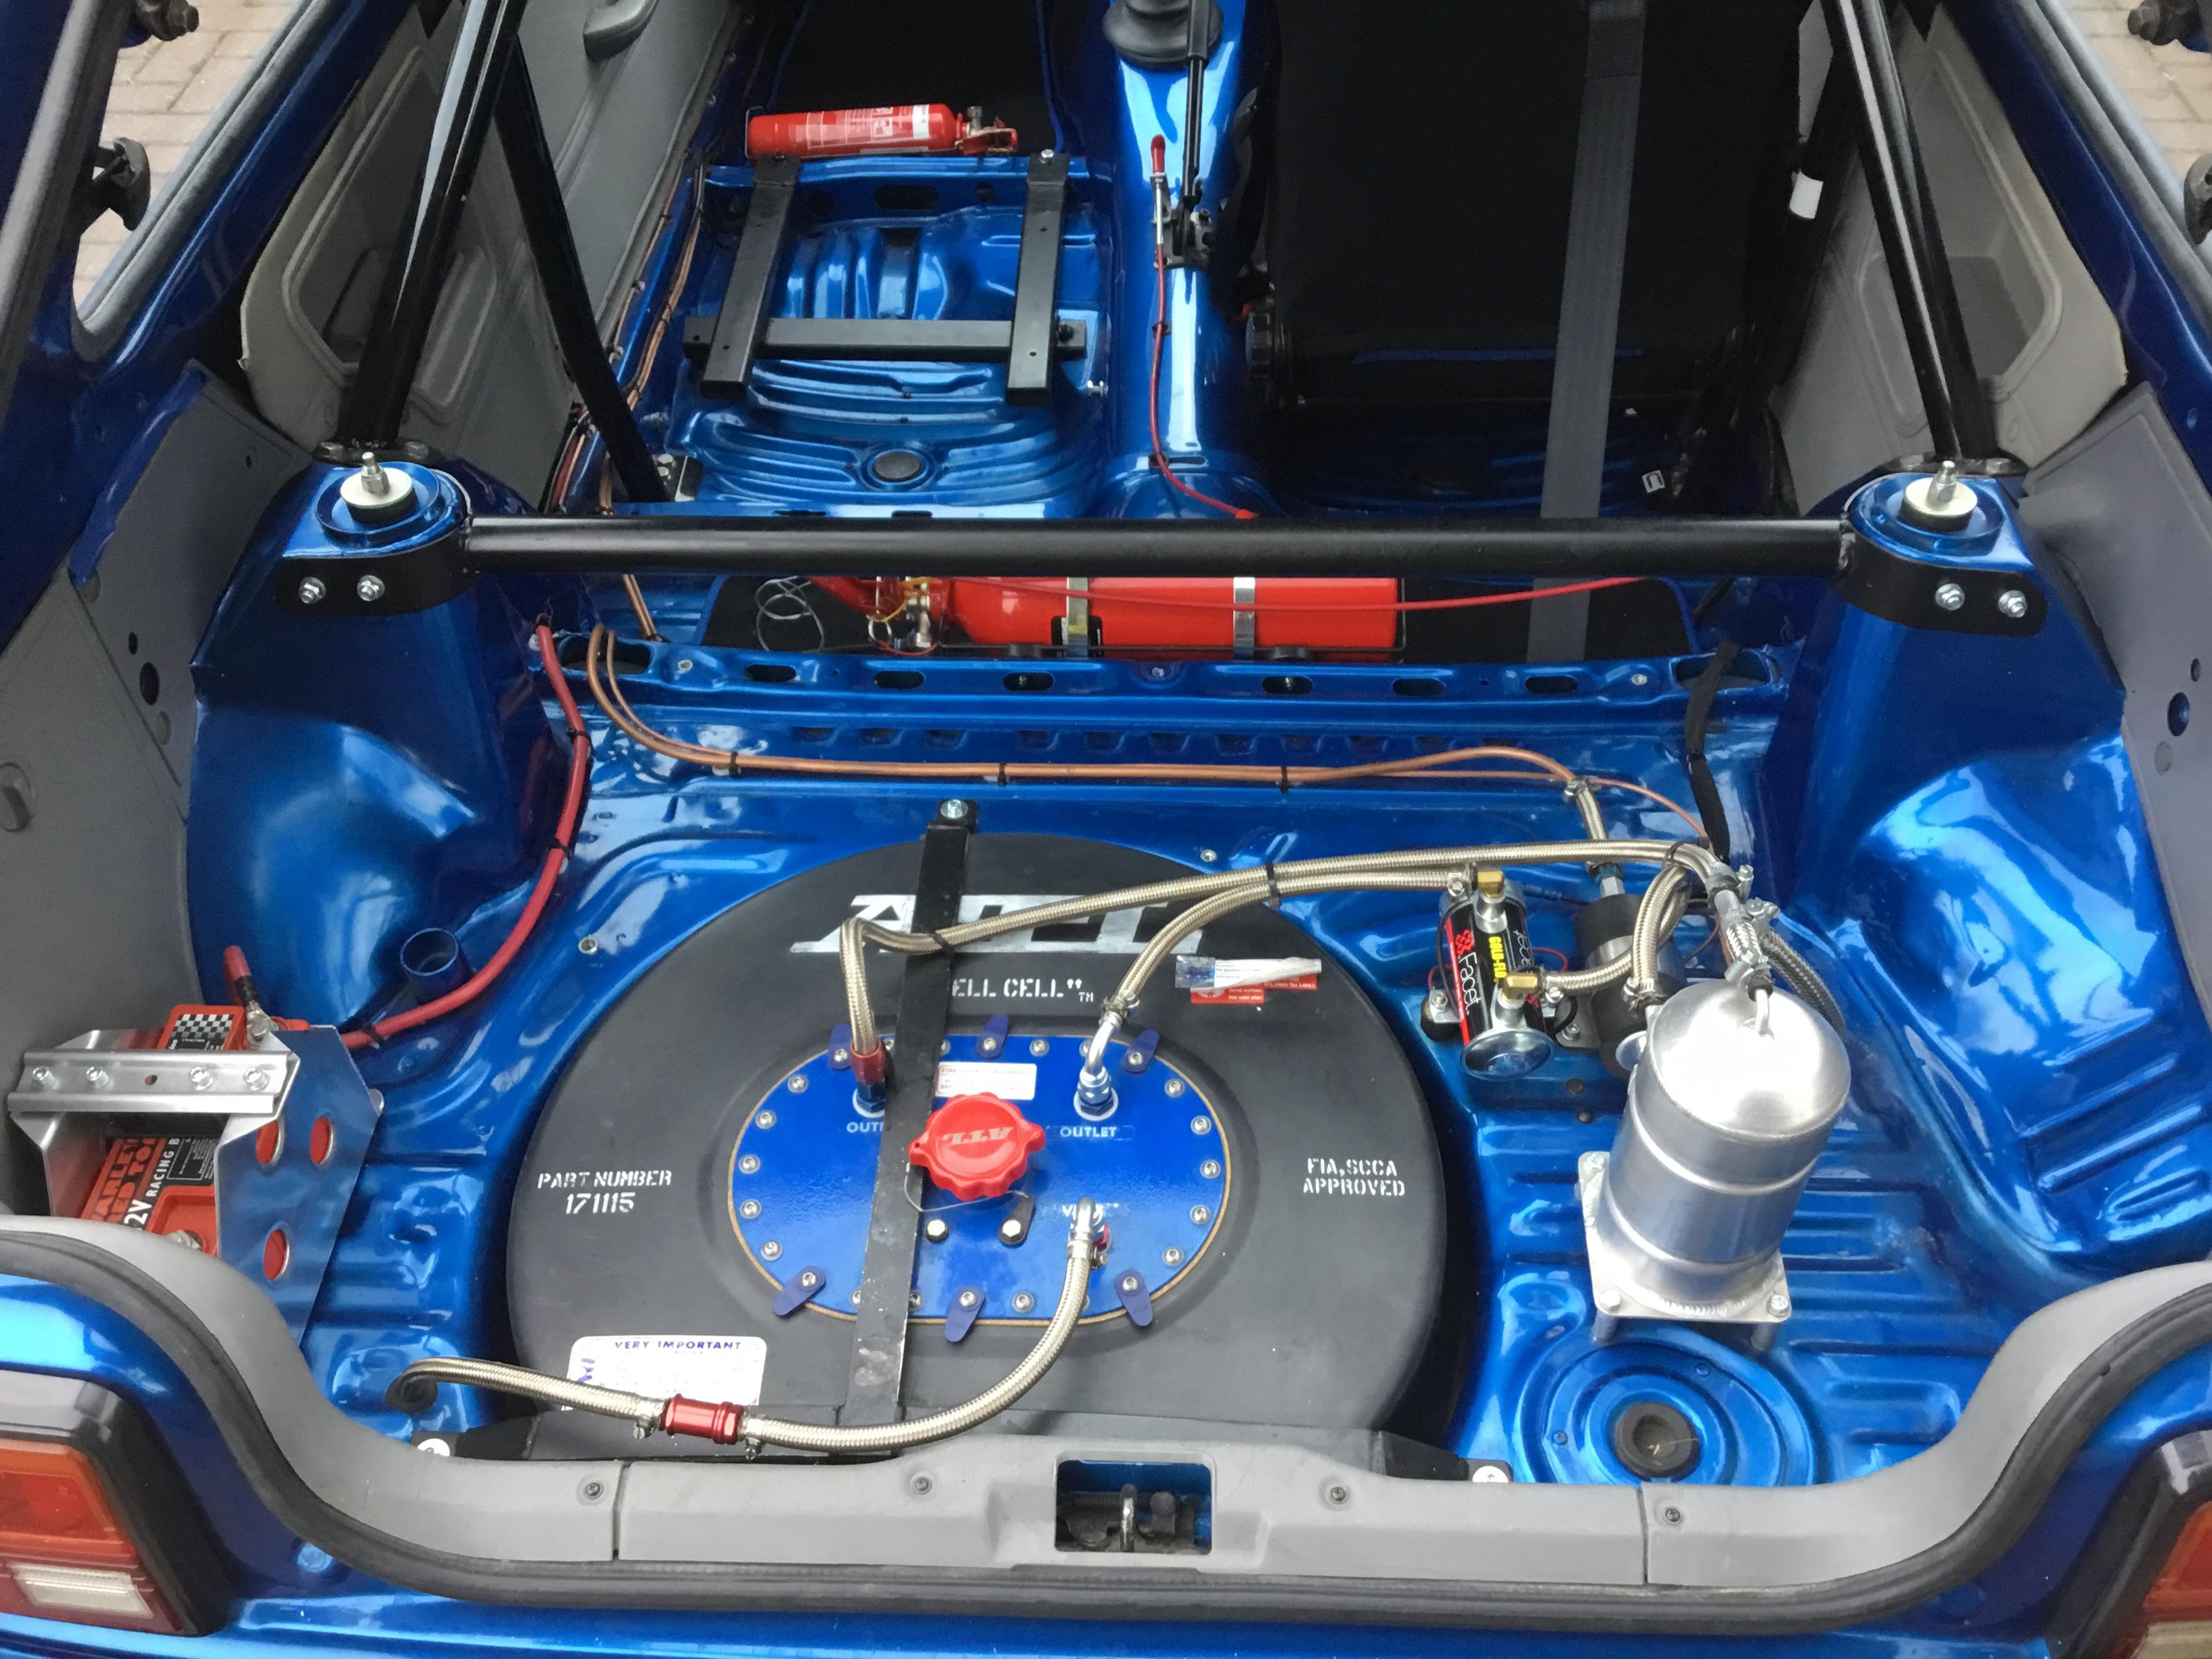 Toyota starlet kp60 Honda S2000 powered 260 hp